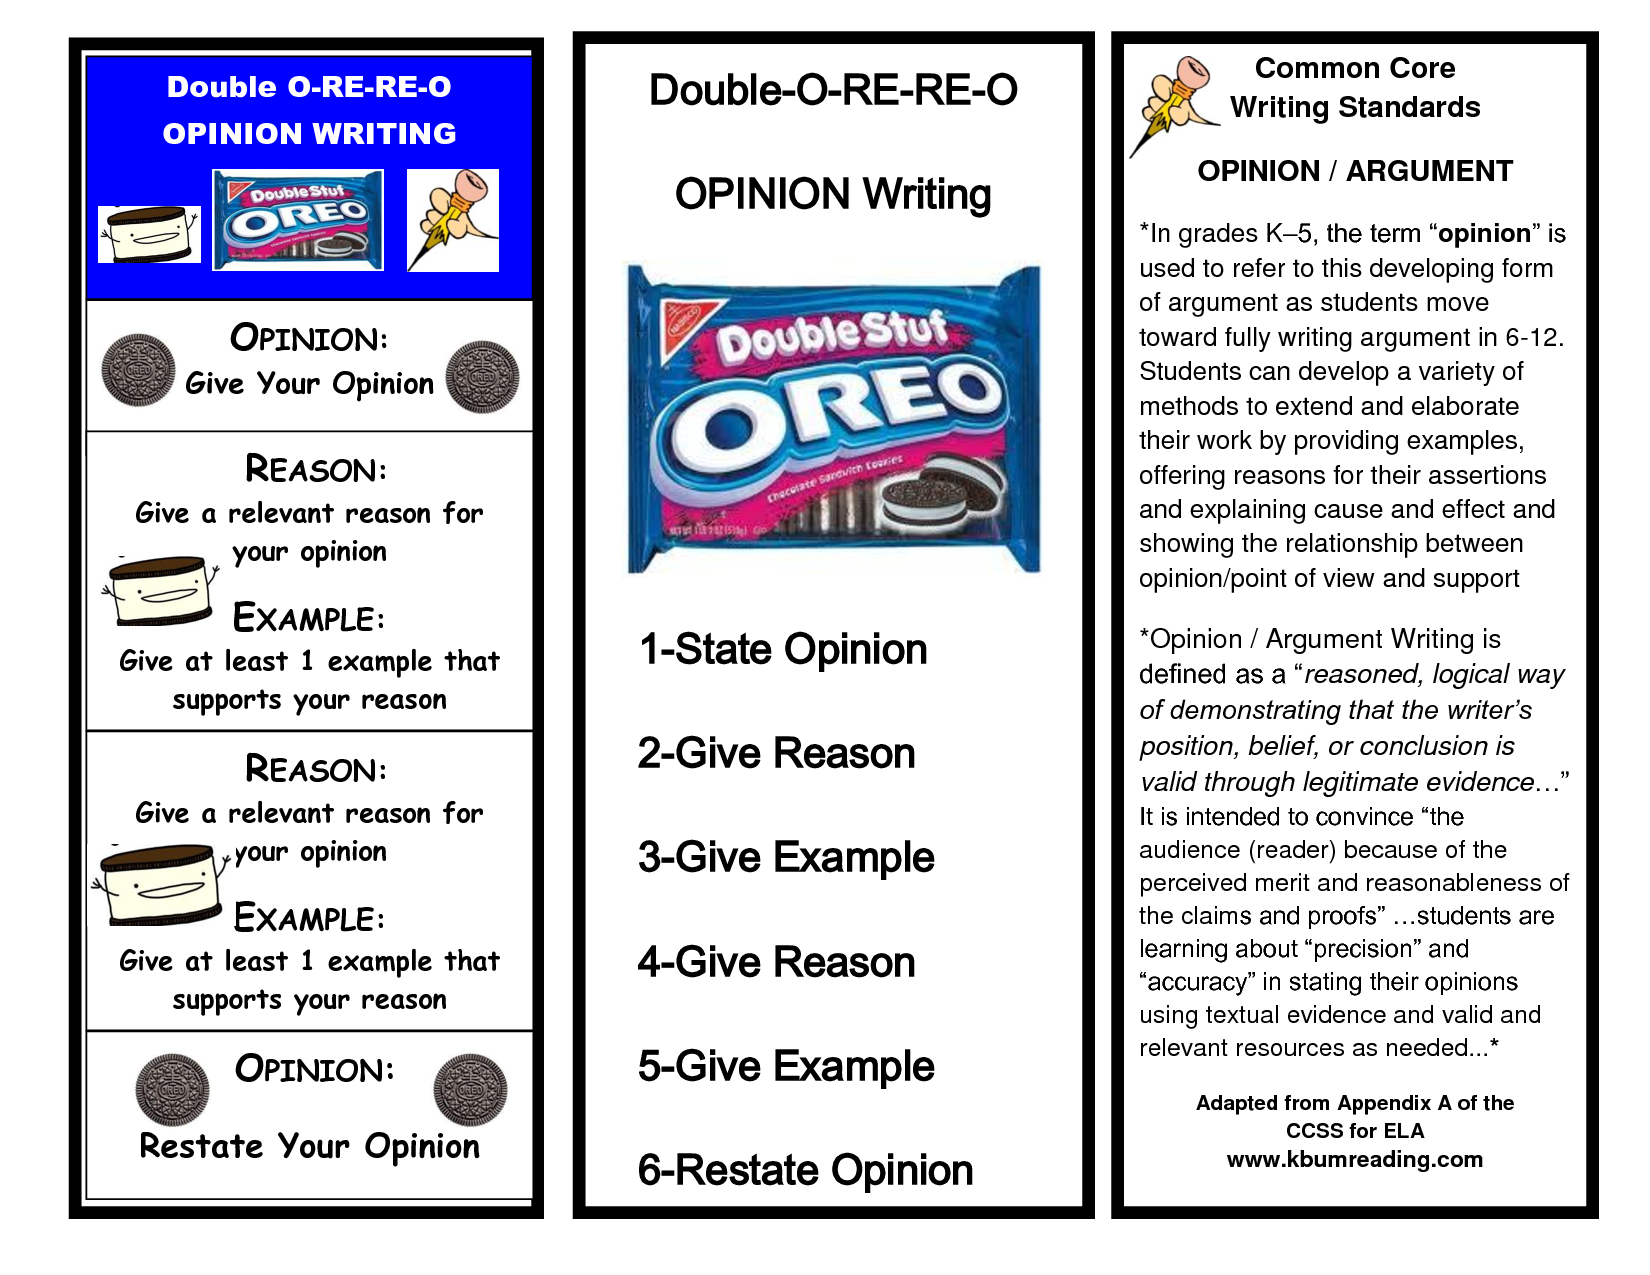 Oreo Opinion Writing Opinion Writing Oreo Opinion Writing Persuasive Writing